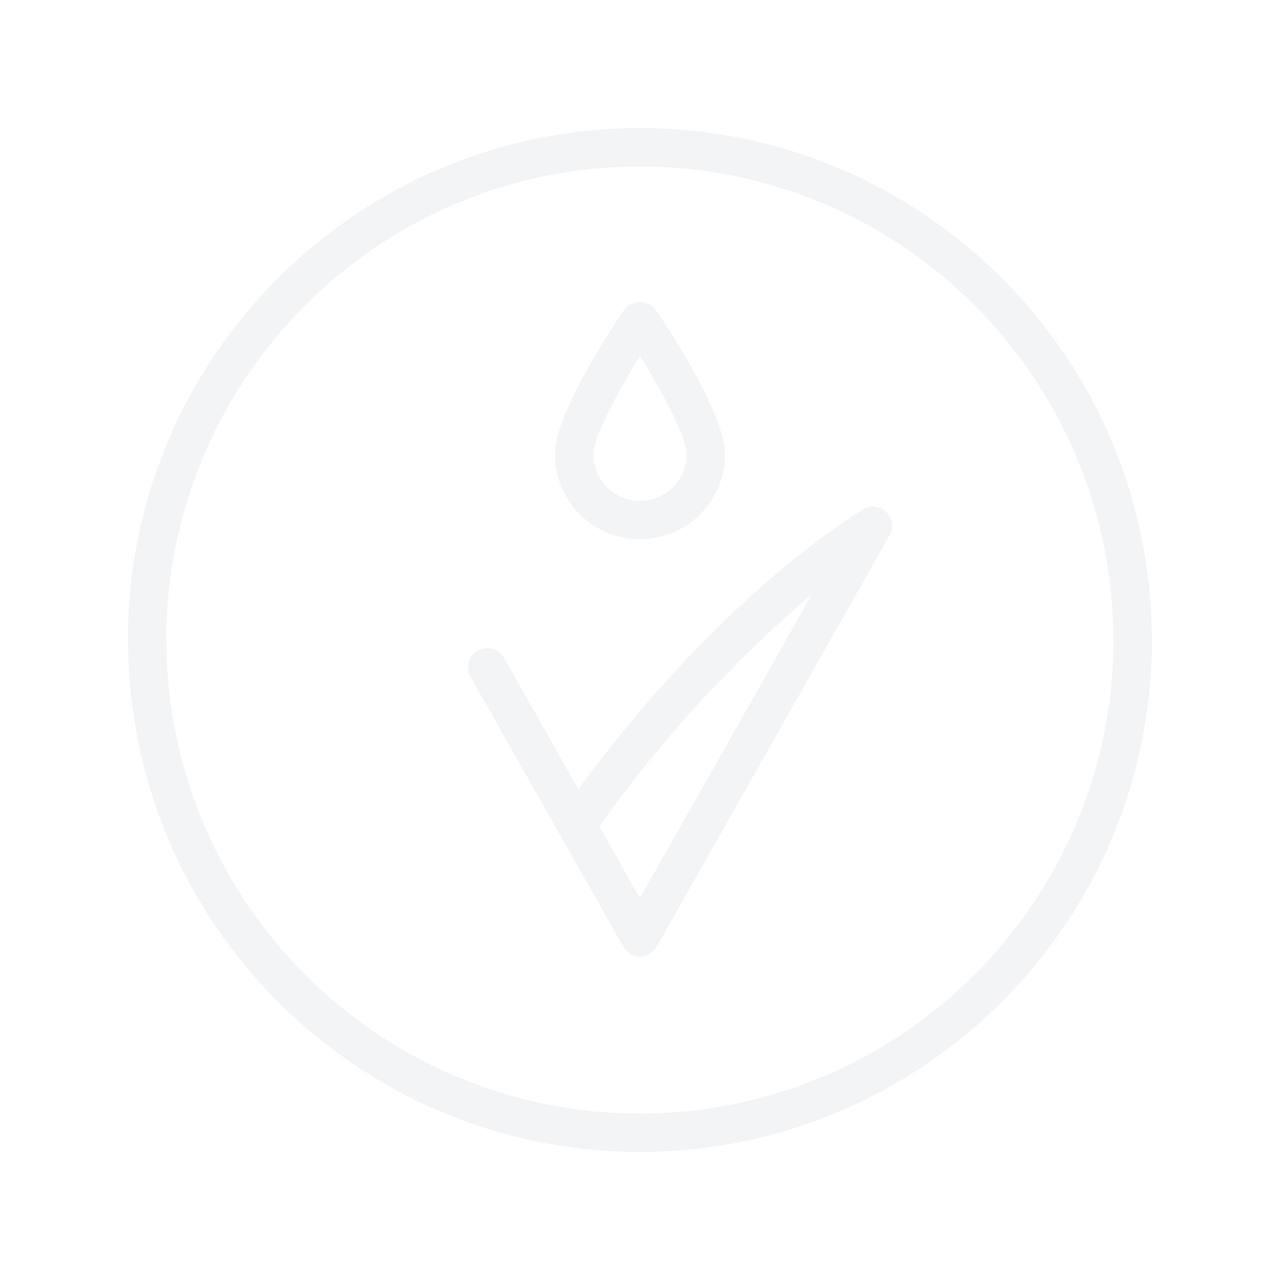 DR. OHHIRA Kampuku Probiotic Beauty Soap 80g